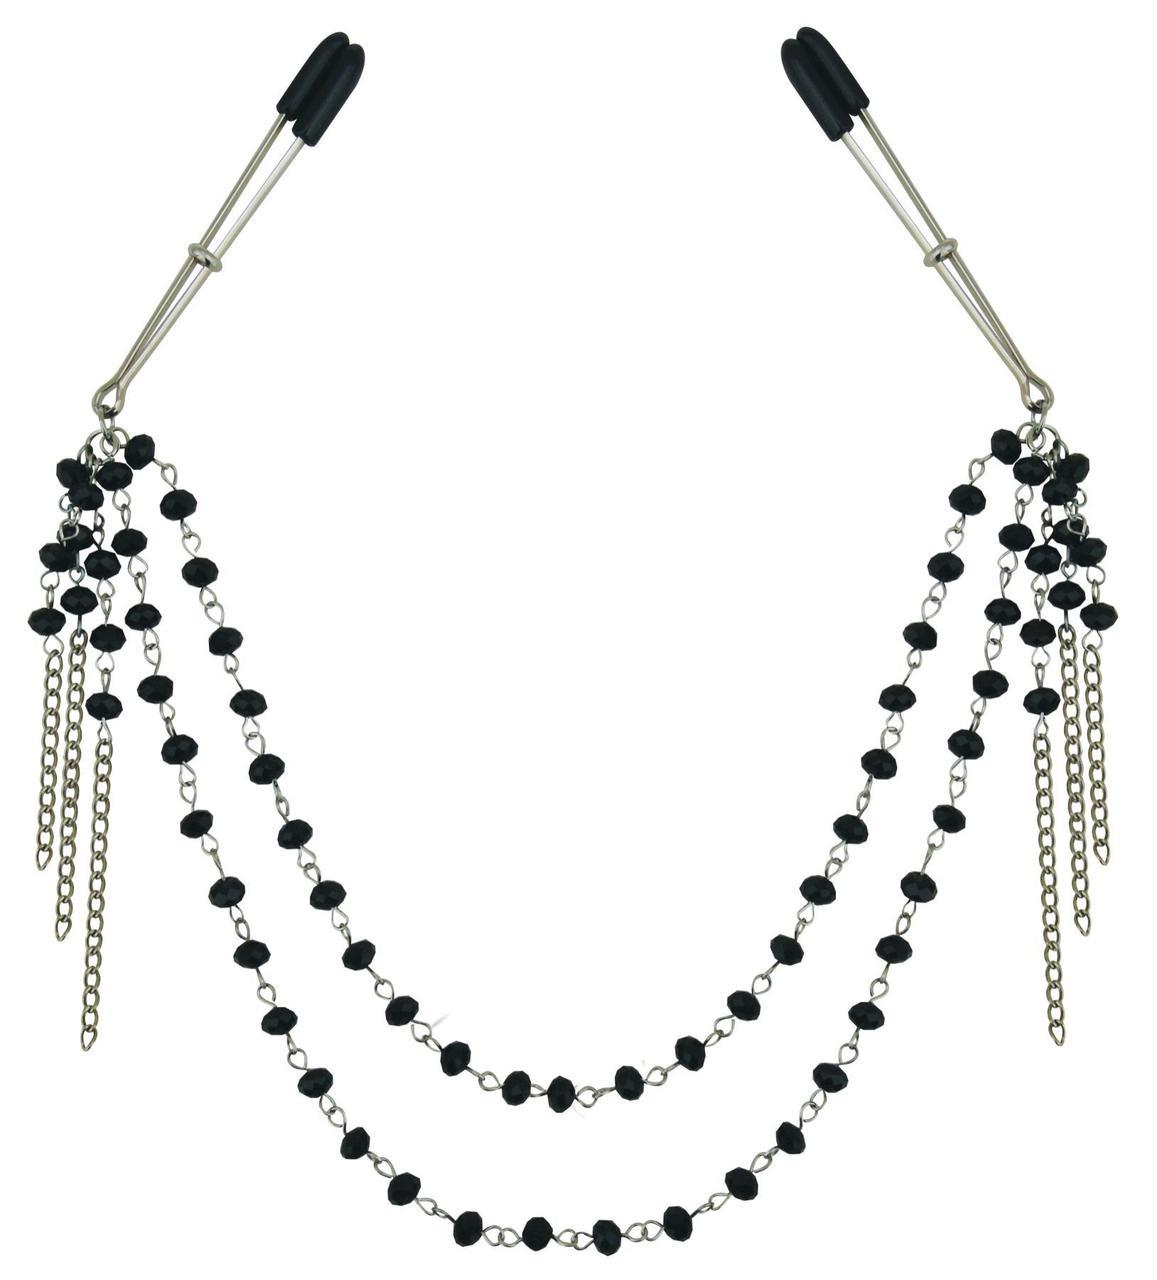 Украшение цепочка с зажимами для сосков Sportsheets Midnight Black Jeweled Nipple Clips SO1291